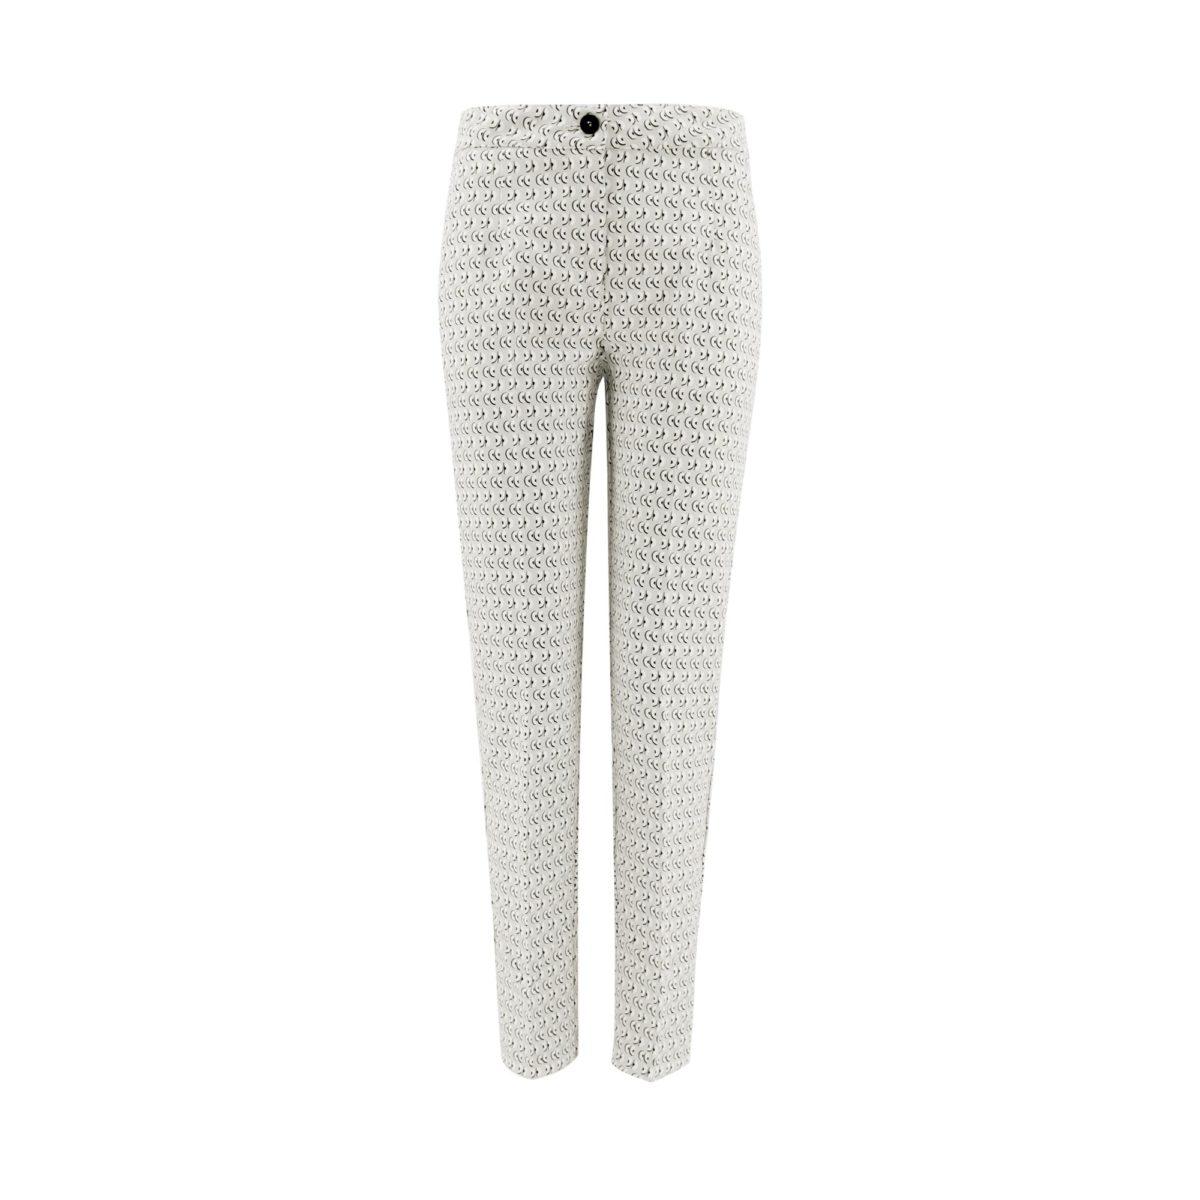 Pantalone Straight a fantasia geometrica  - vista frontale | Nicla